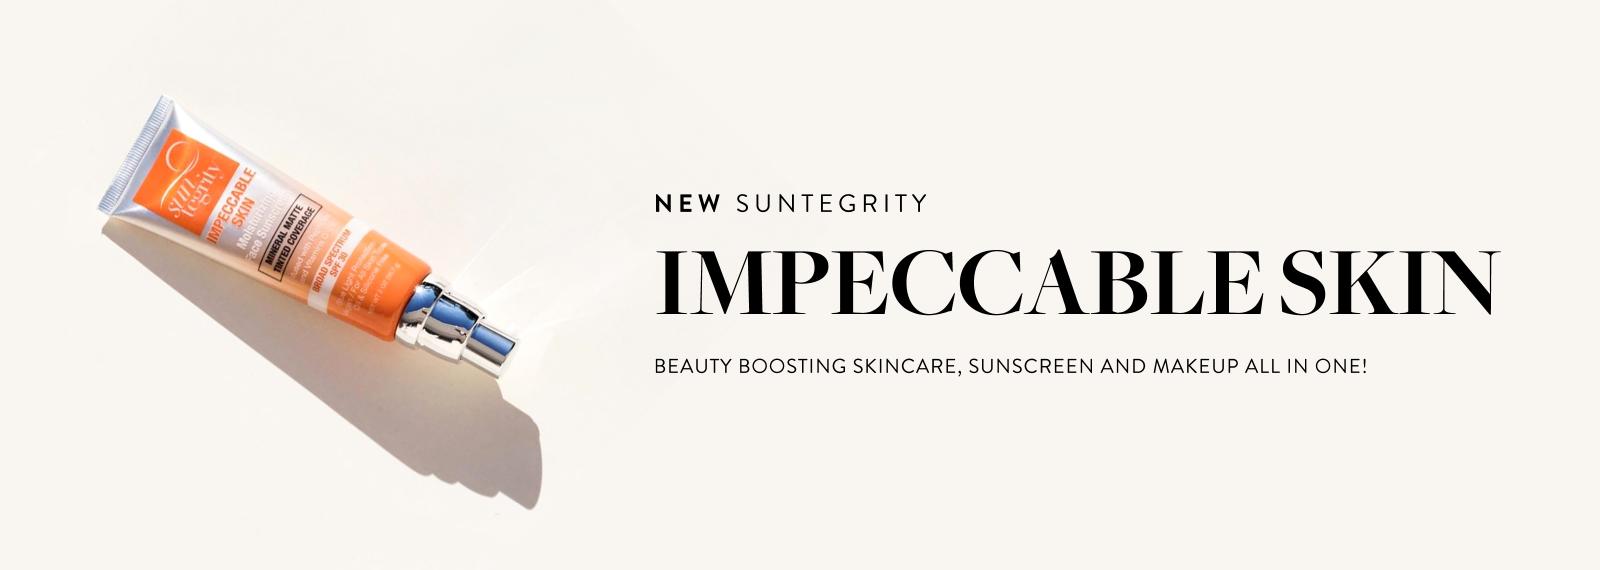 New - SUNTEGRITY - Impeccable Skin